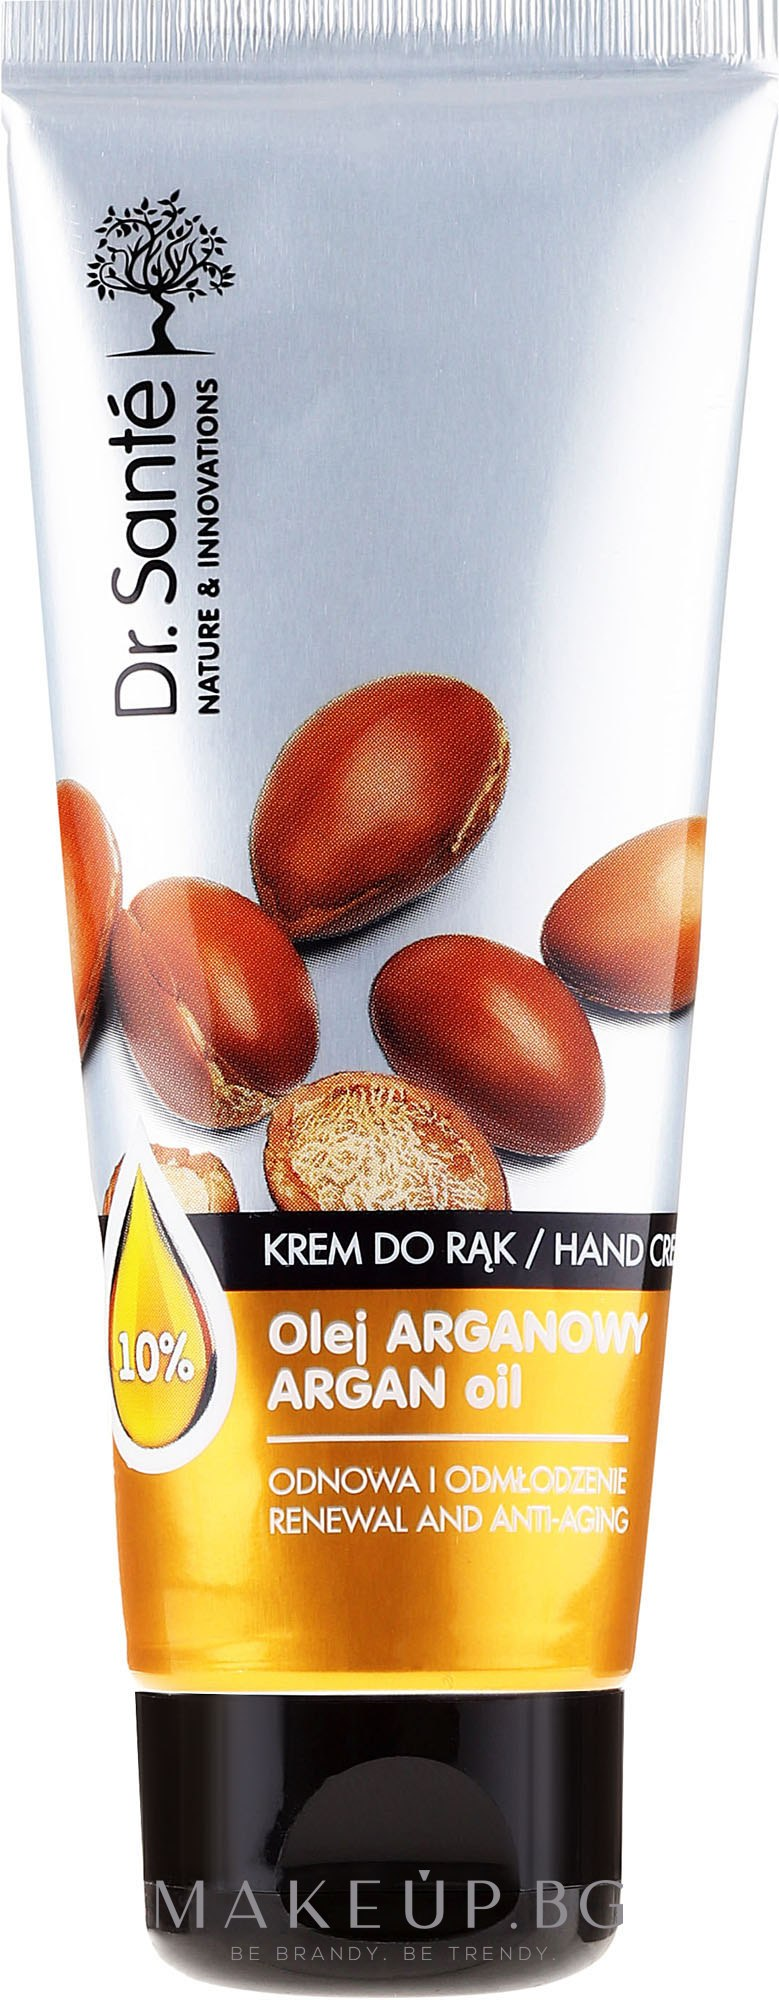 Регенериращ крем за ръце - Dr. Sante Hand Cream Argan Oil — снимка 75 ml